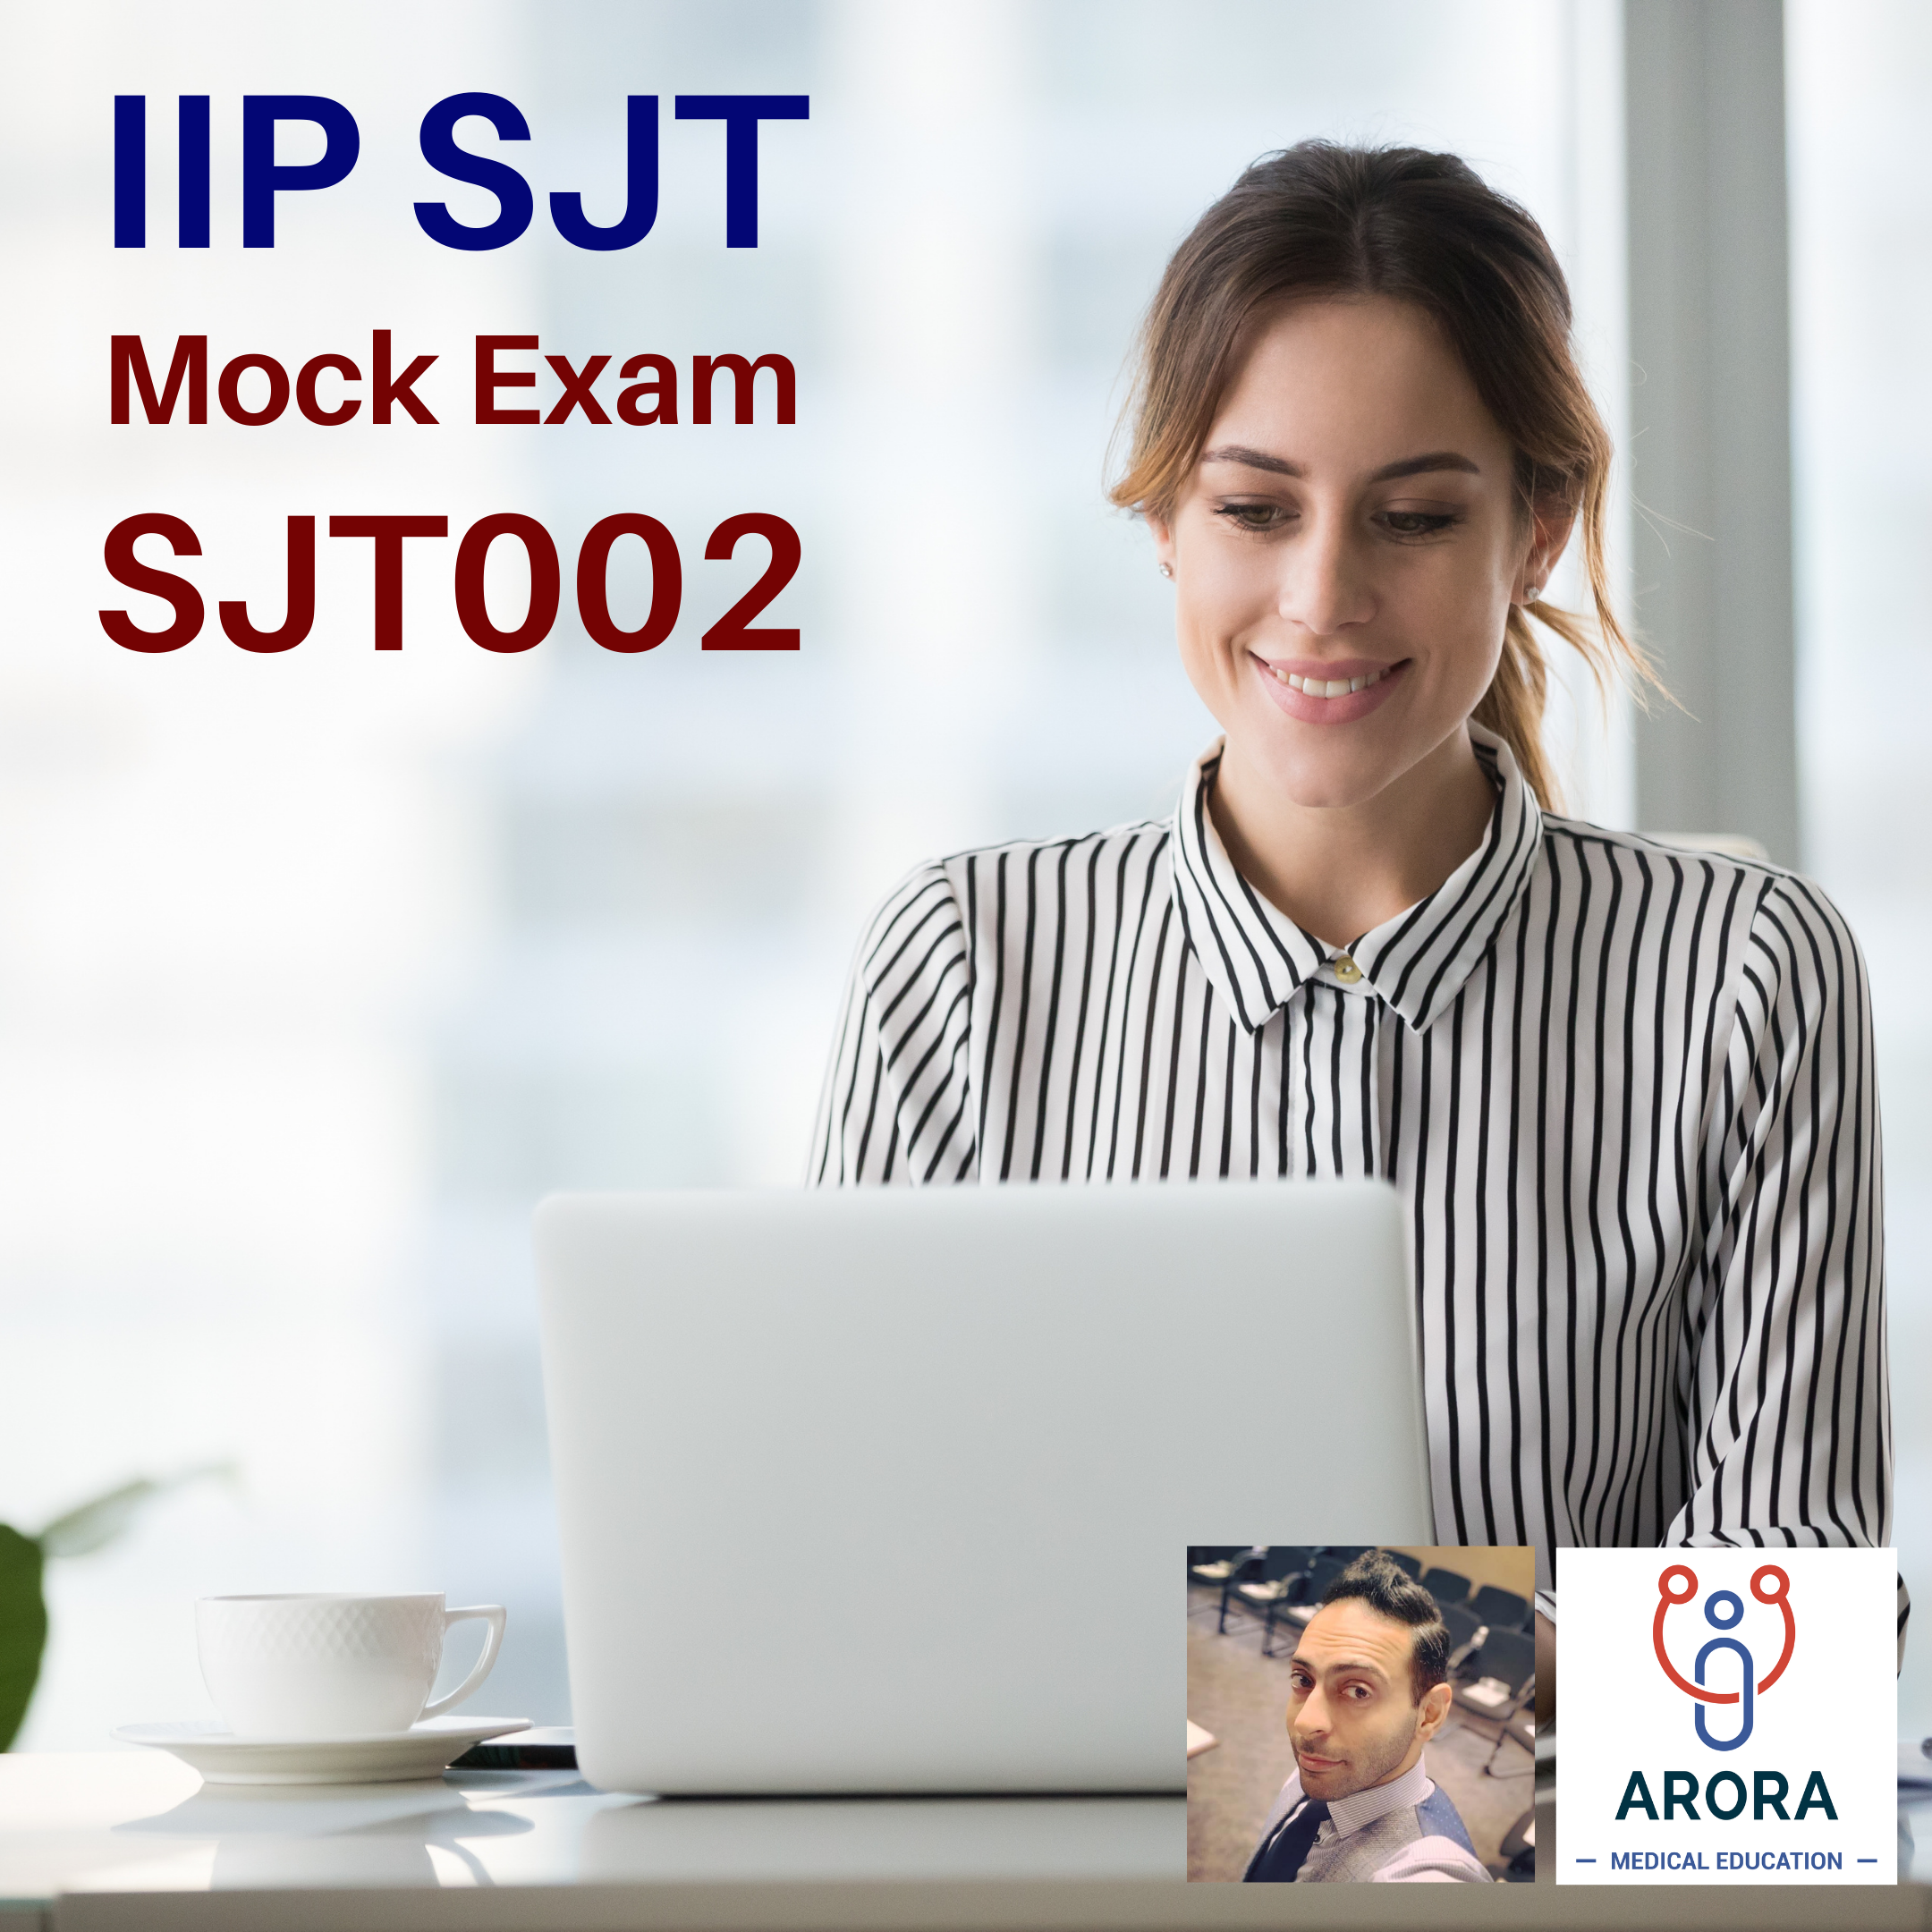 IIP SJT 002 - MRCGP CSA, AKT and PLAB Exam Courses and Online Webinars - Arora Medical Education